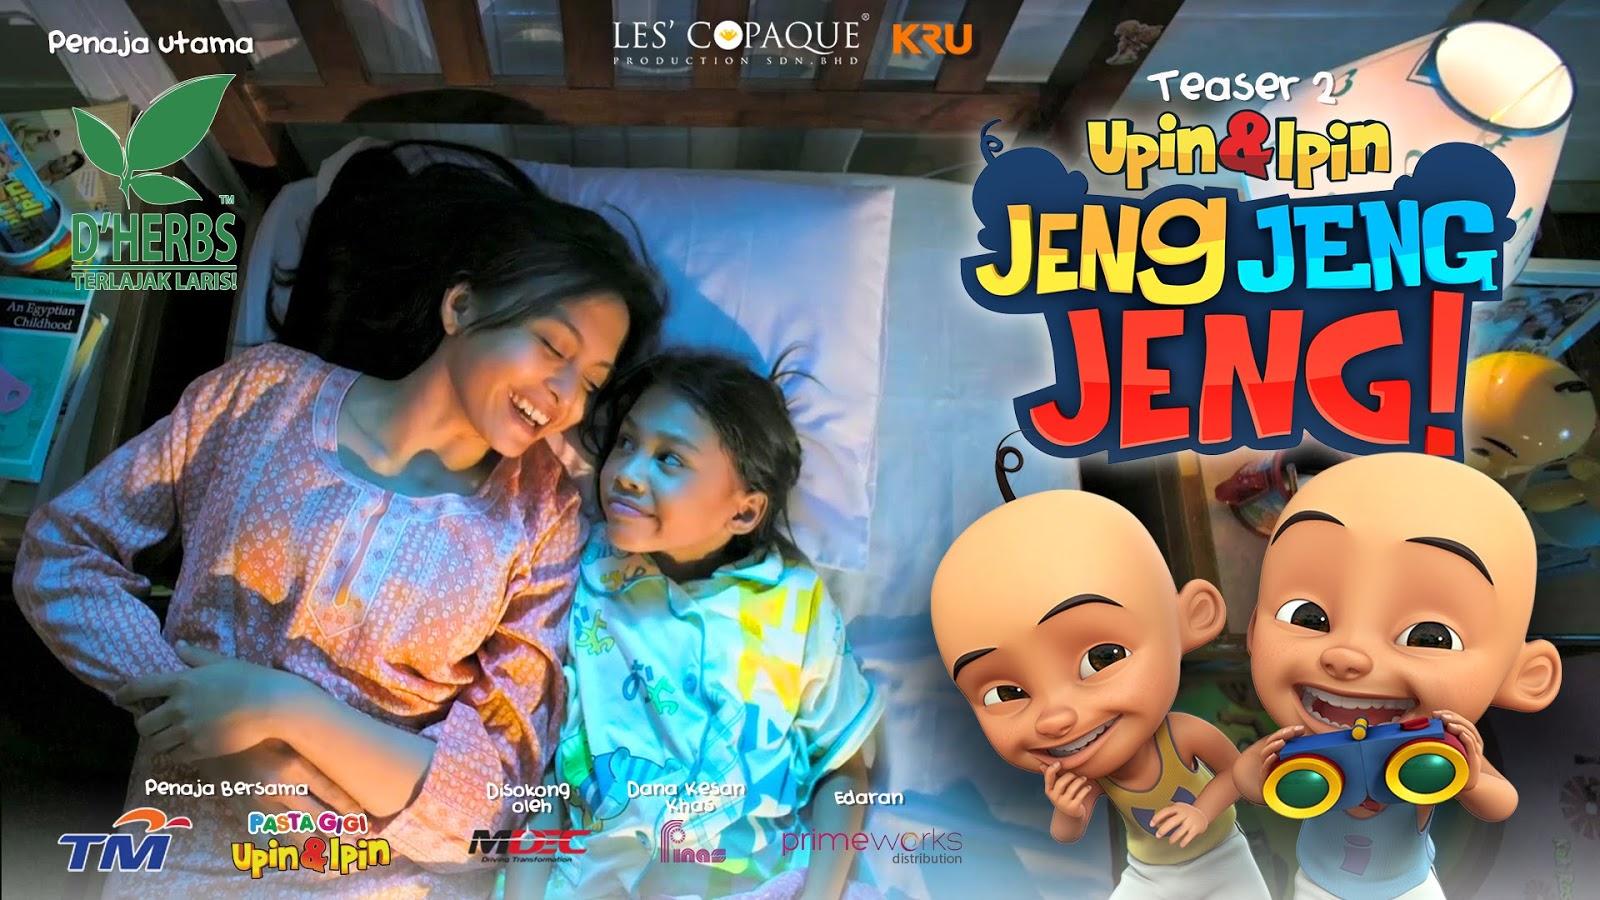 Tonton Upin dan Ipin Jeng Jeng Jeng Full Movie